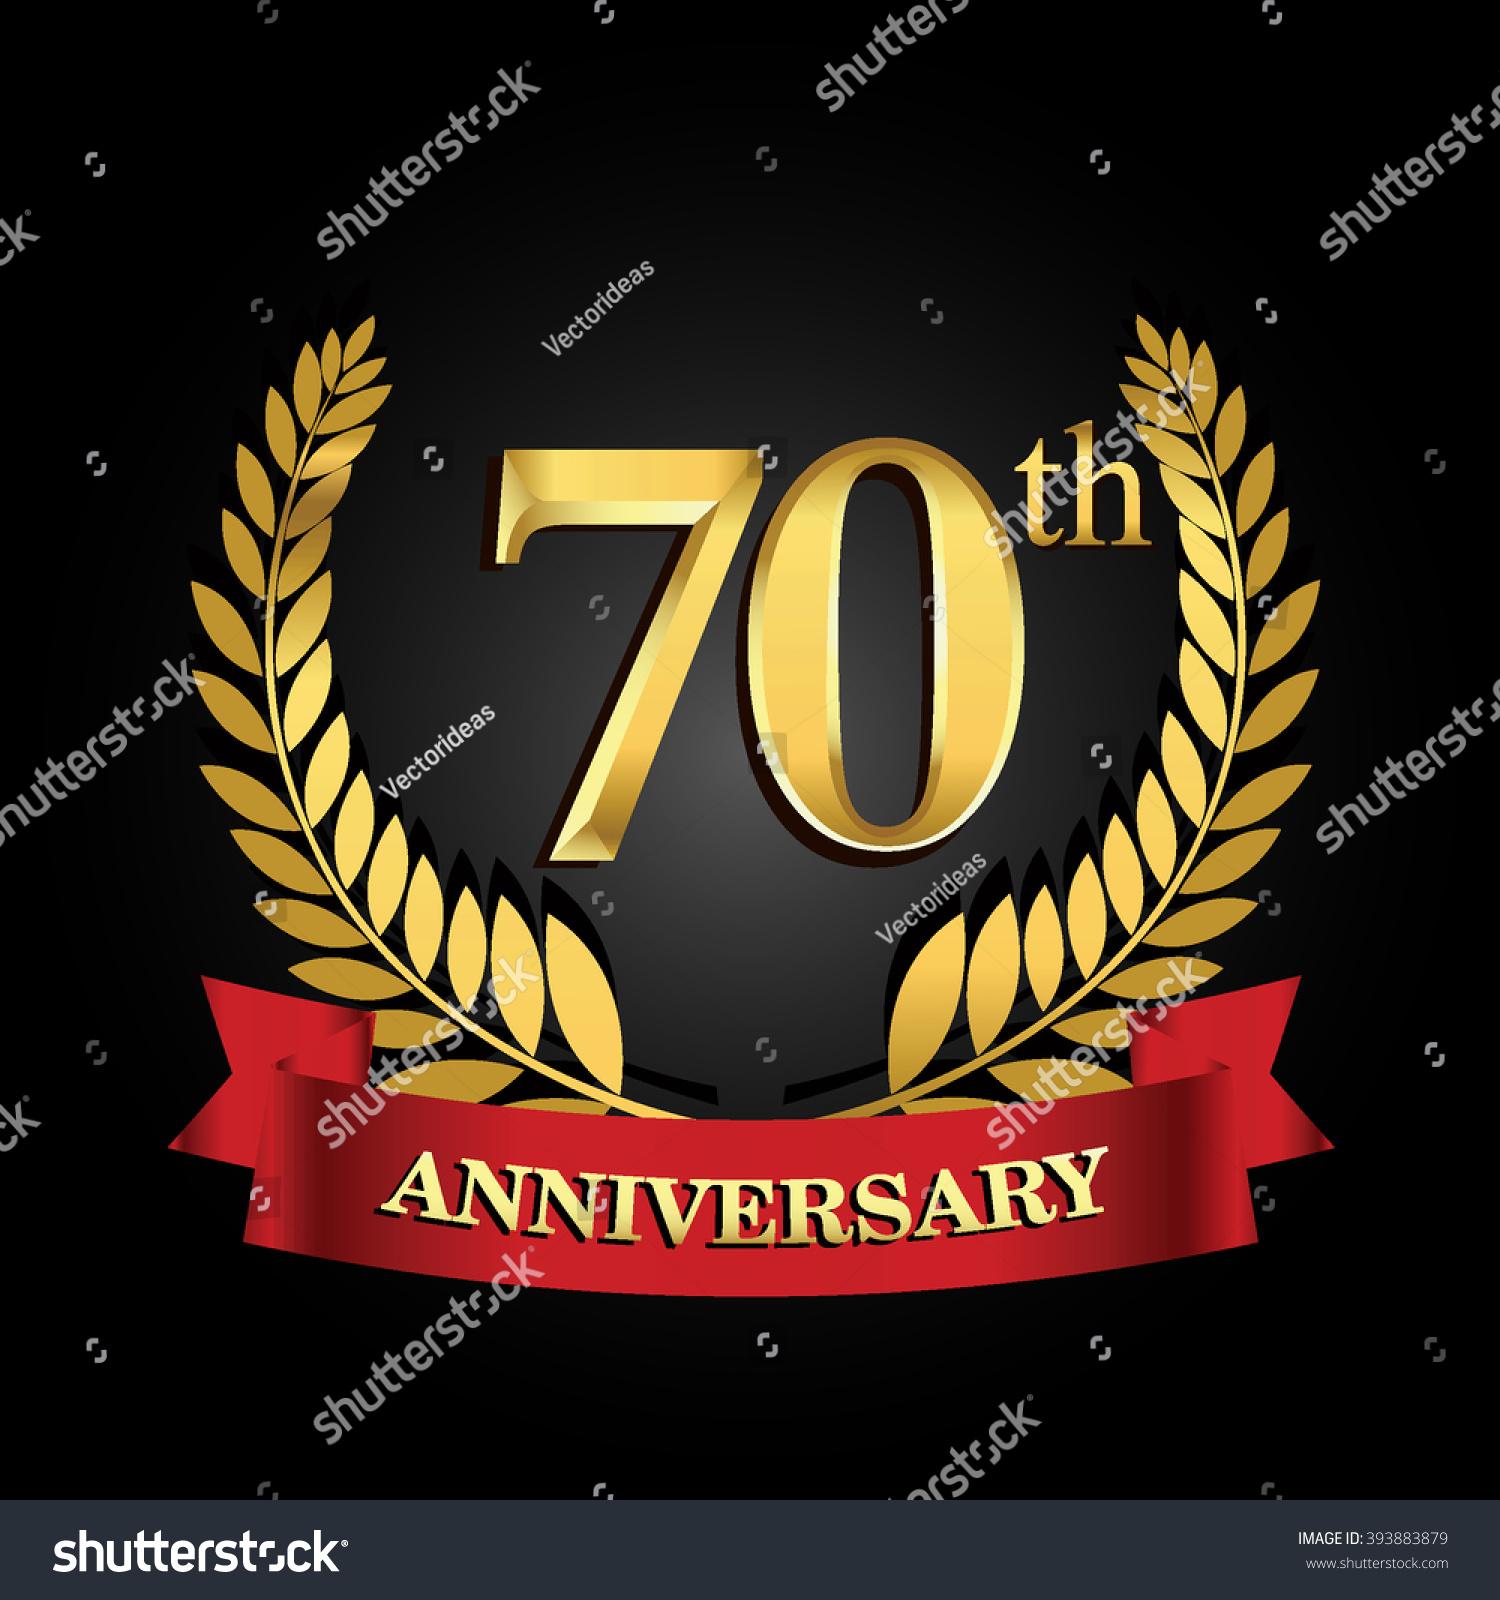 70th anniversary logo red ribbon golden stock vector 25th Anniversary Seal 25th Anniversary Quotes